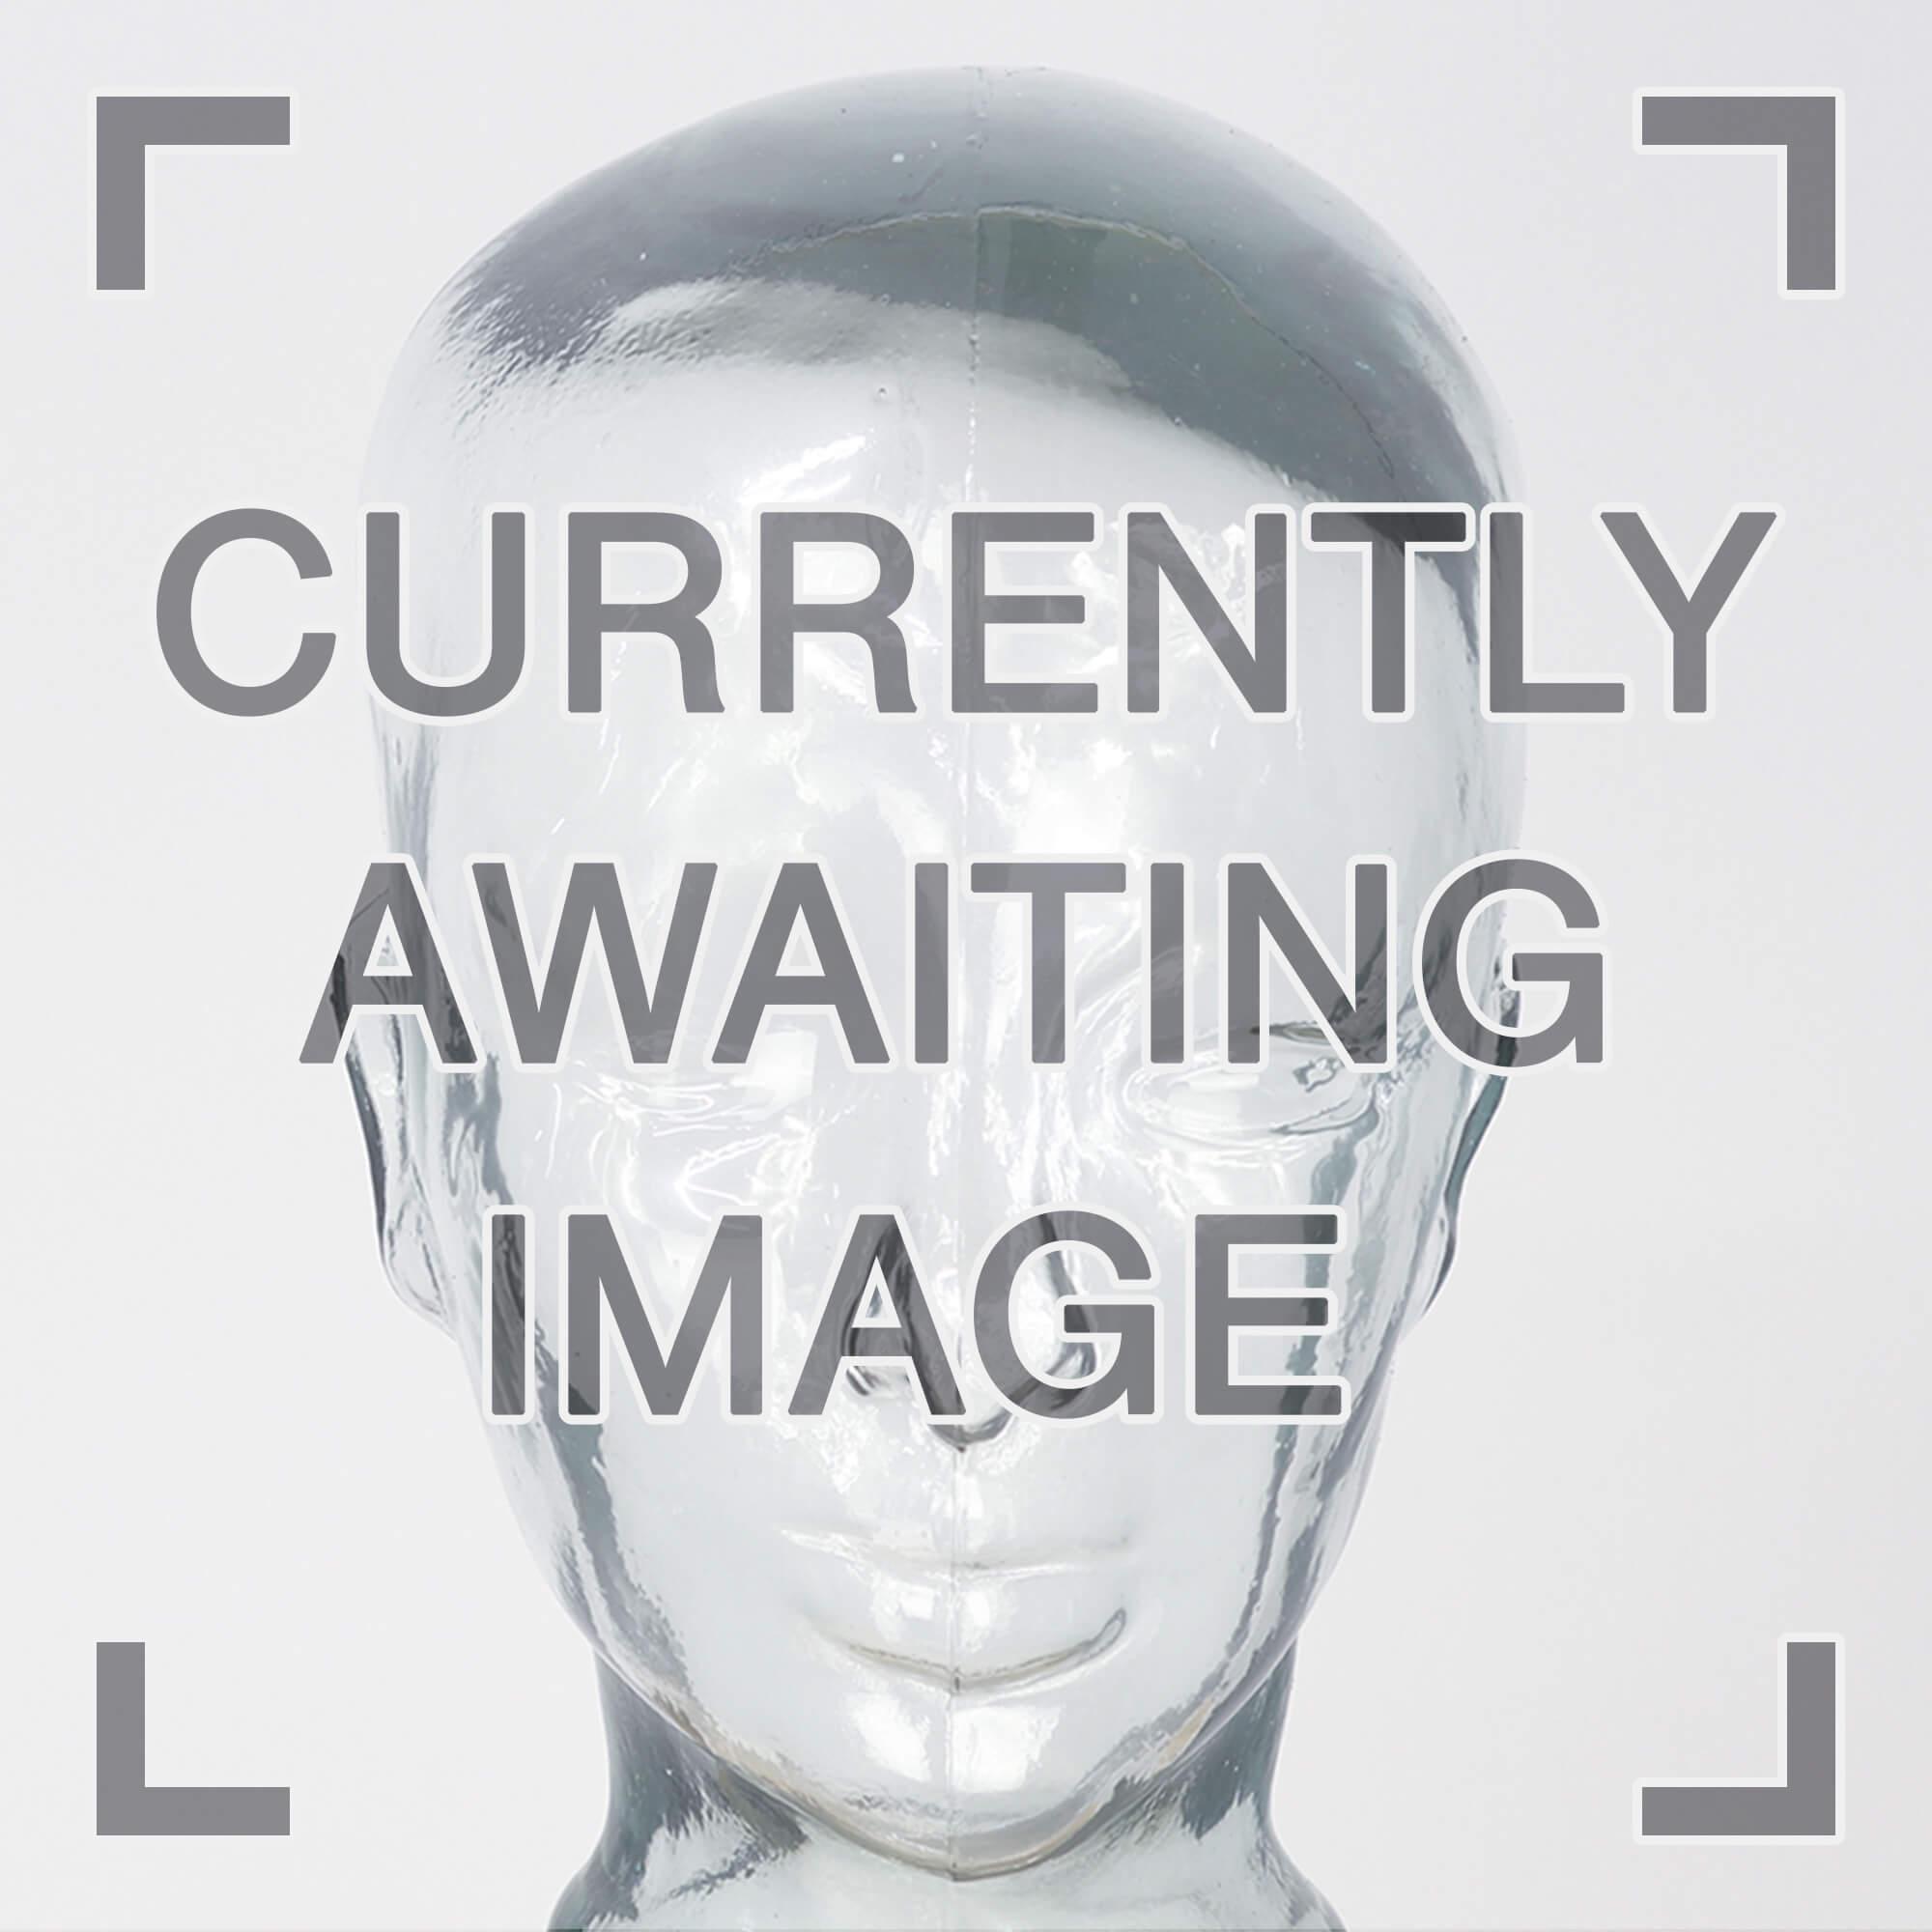 TEAC USB DAC/Headphone Amplifier